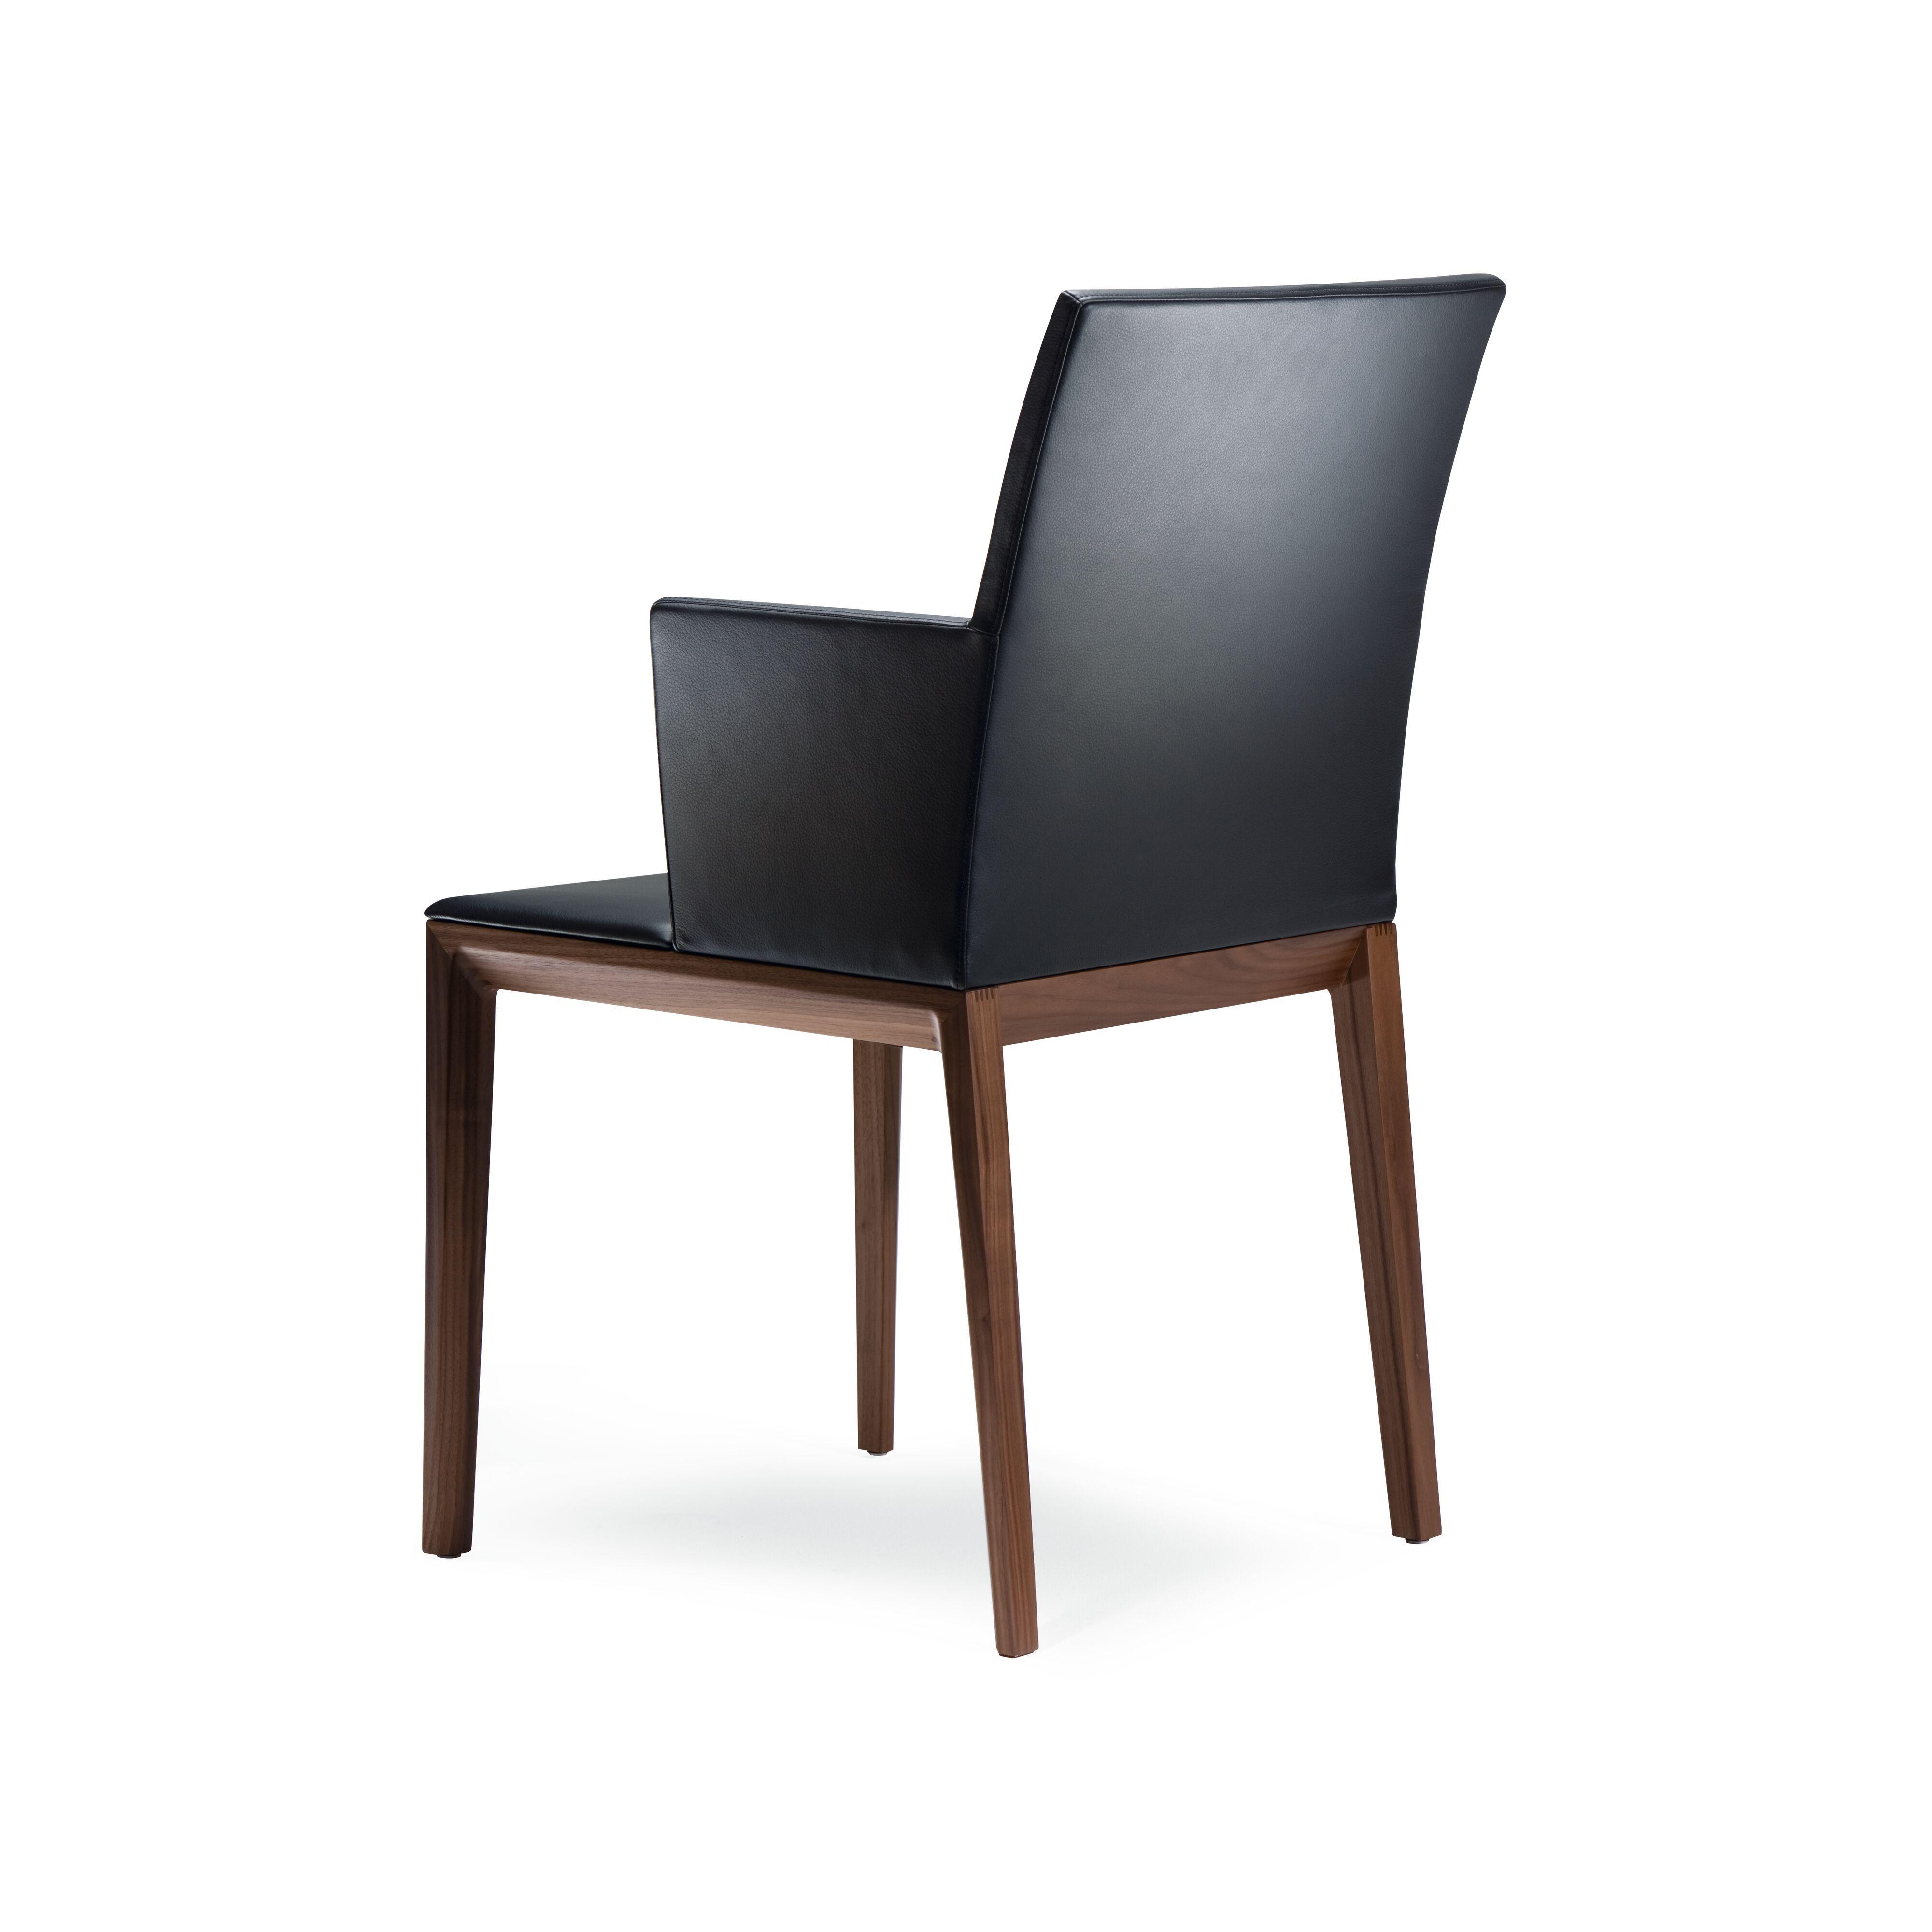 04_WK-Andoo_Chair-0003-H.tif